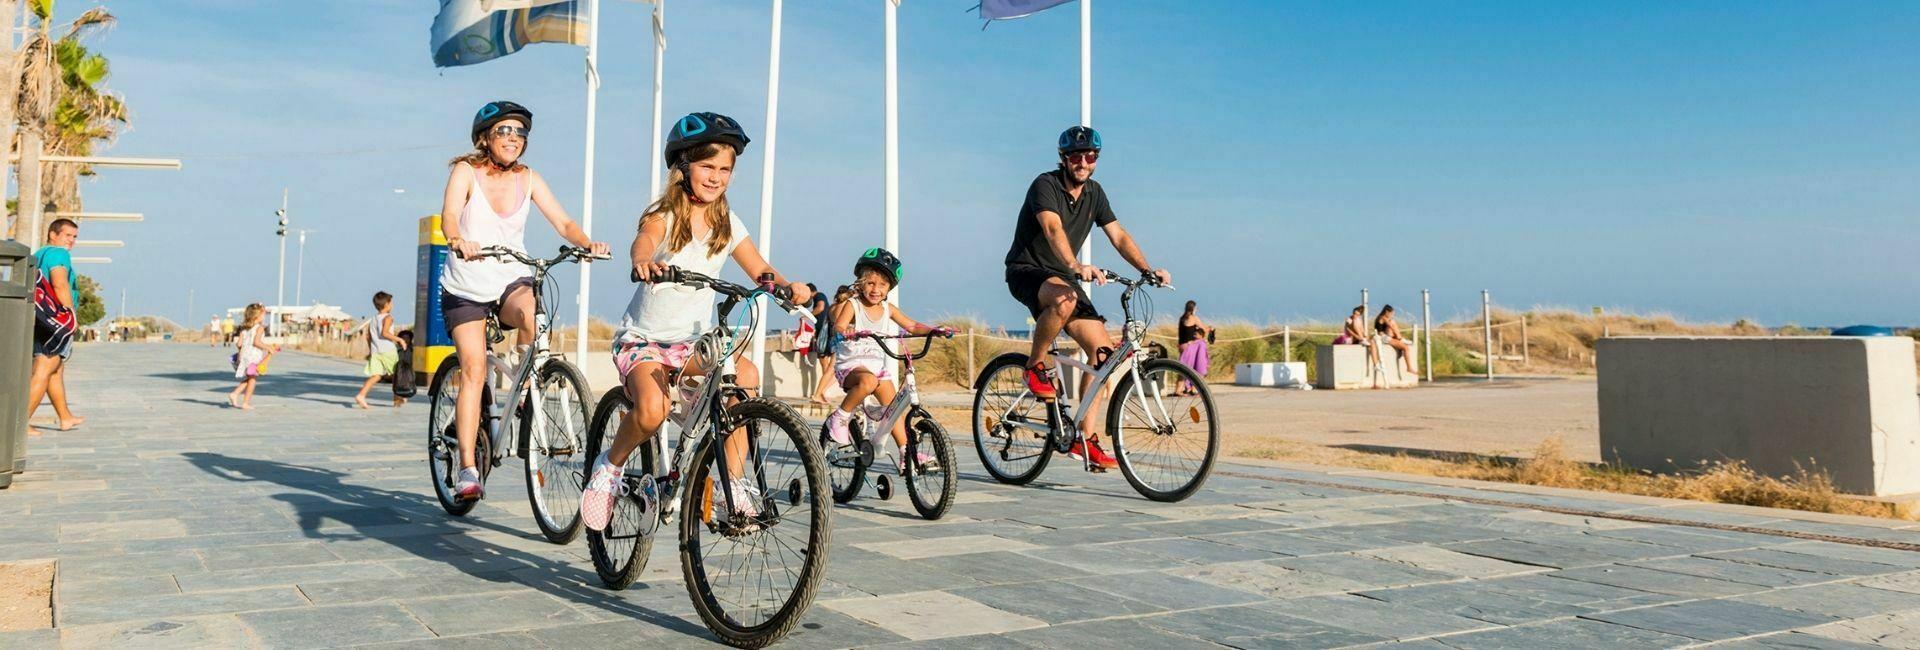 Actividades con niños en Castelldefels